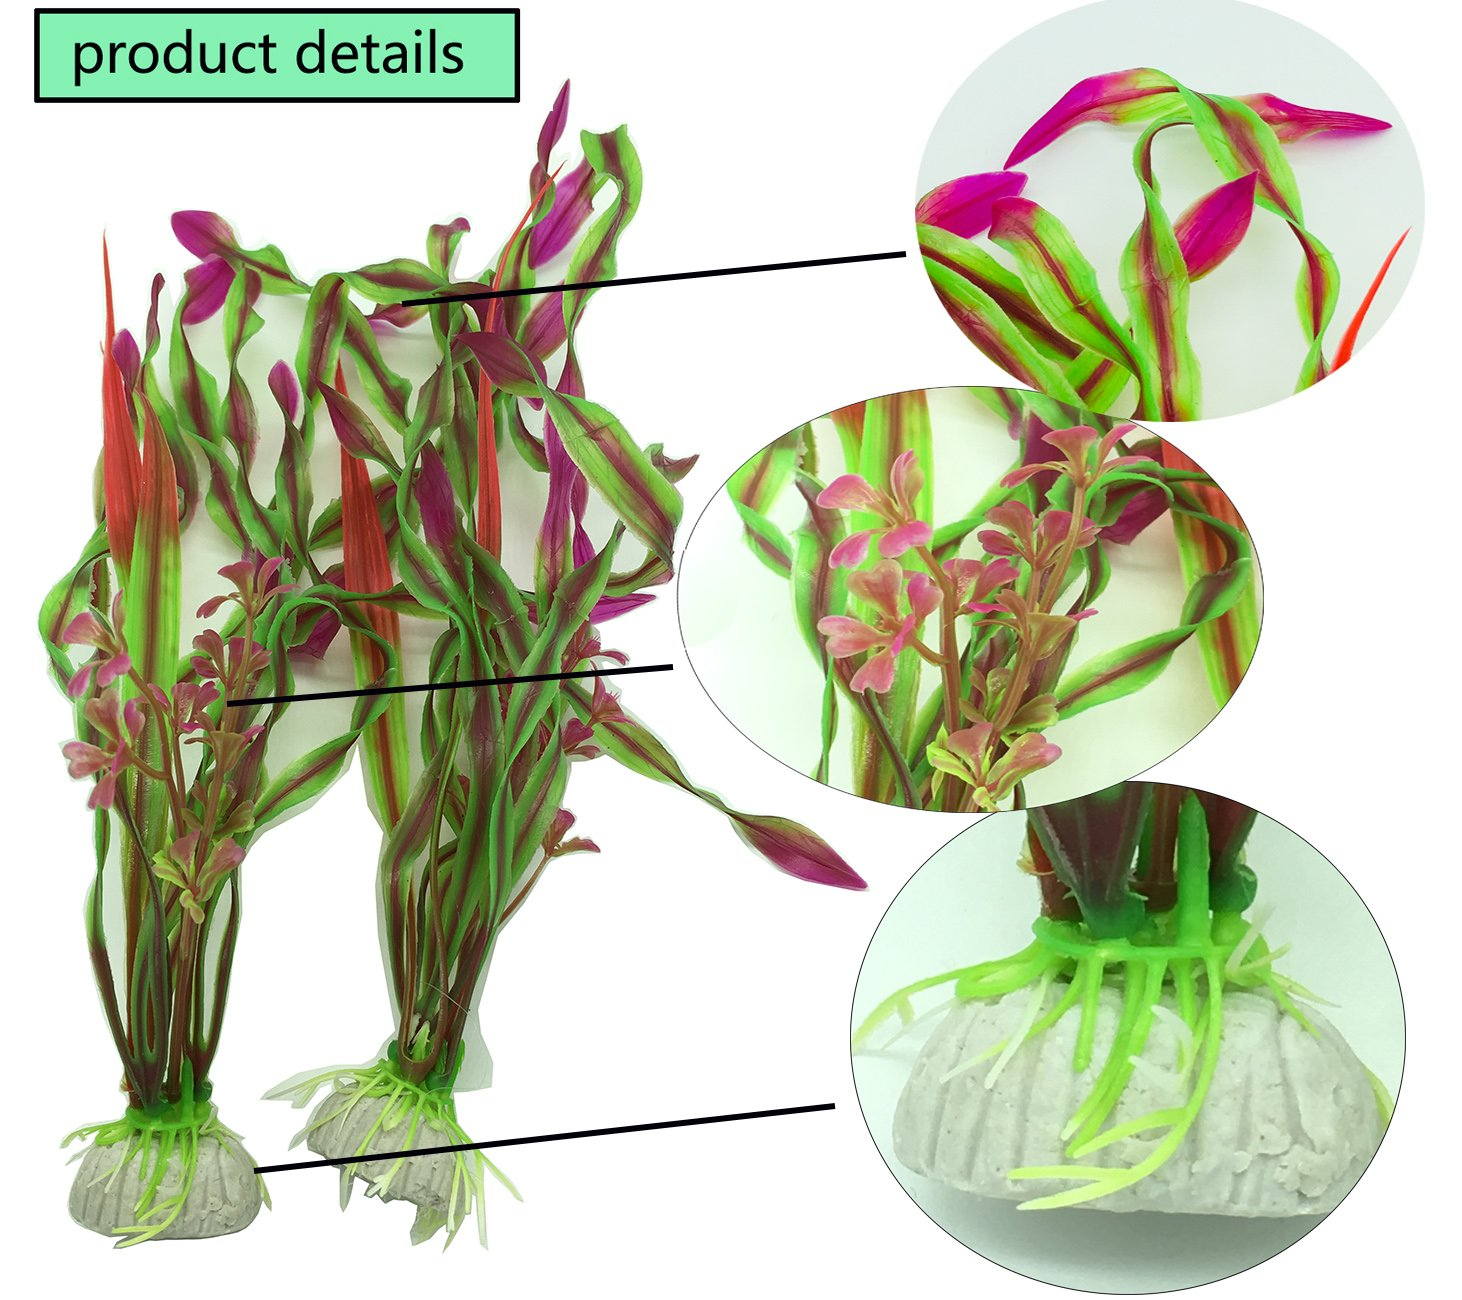 NiceButy 5 pieces of artificial aquatic plants plastic plant aquarium decoration vivid simulation plant biology aquarium landscape pink